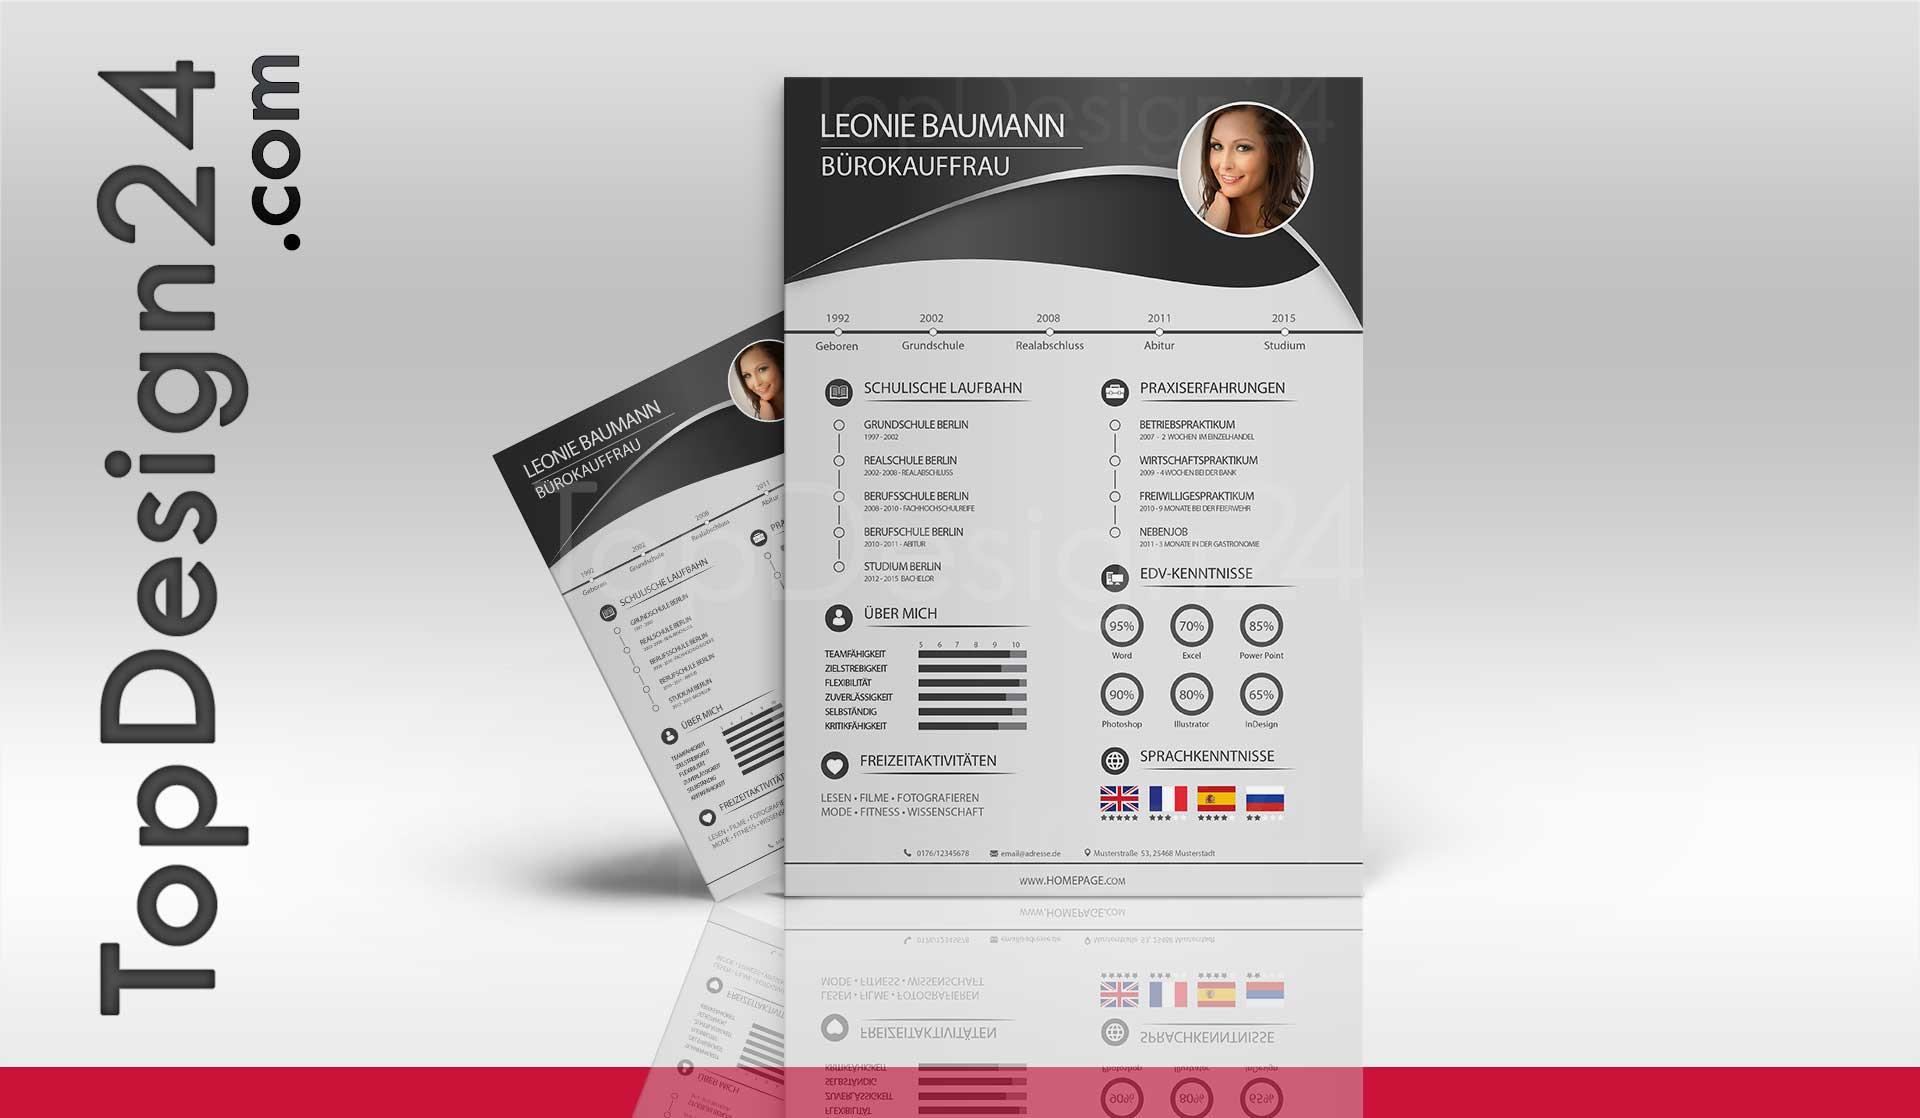 Praktikumsbewerbung Muster -TopDesign24-Ausbildung-Job